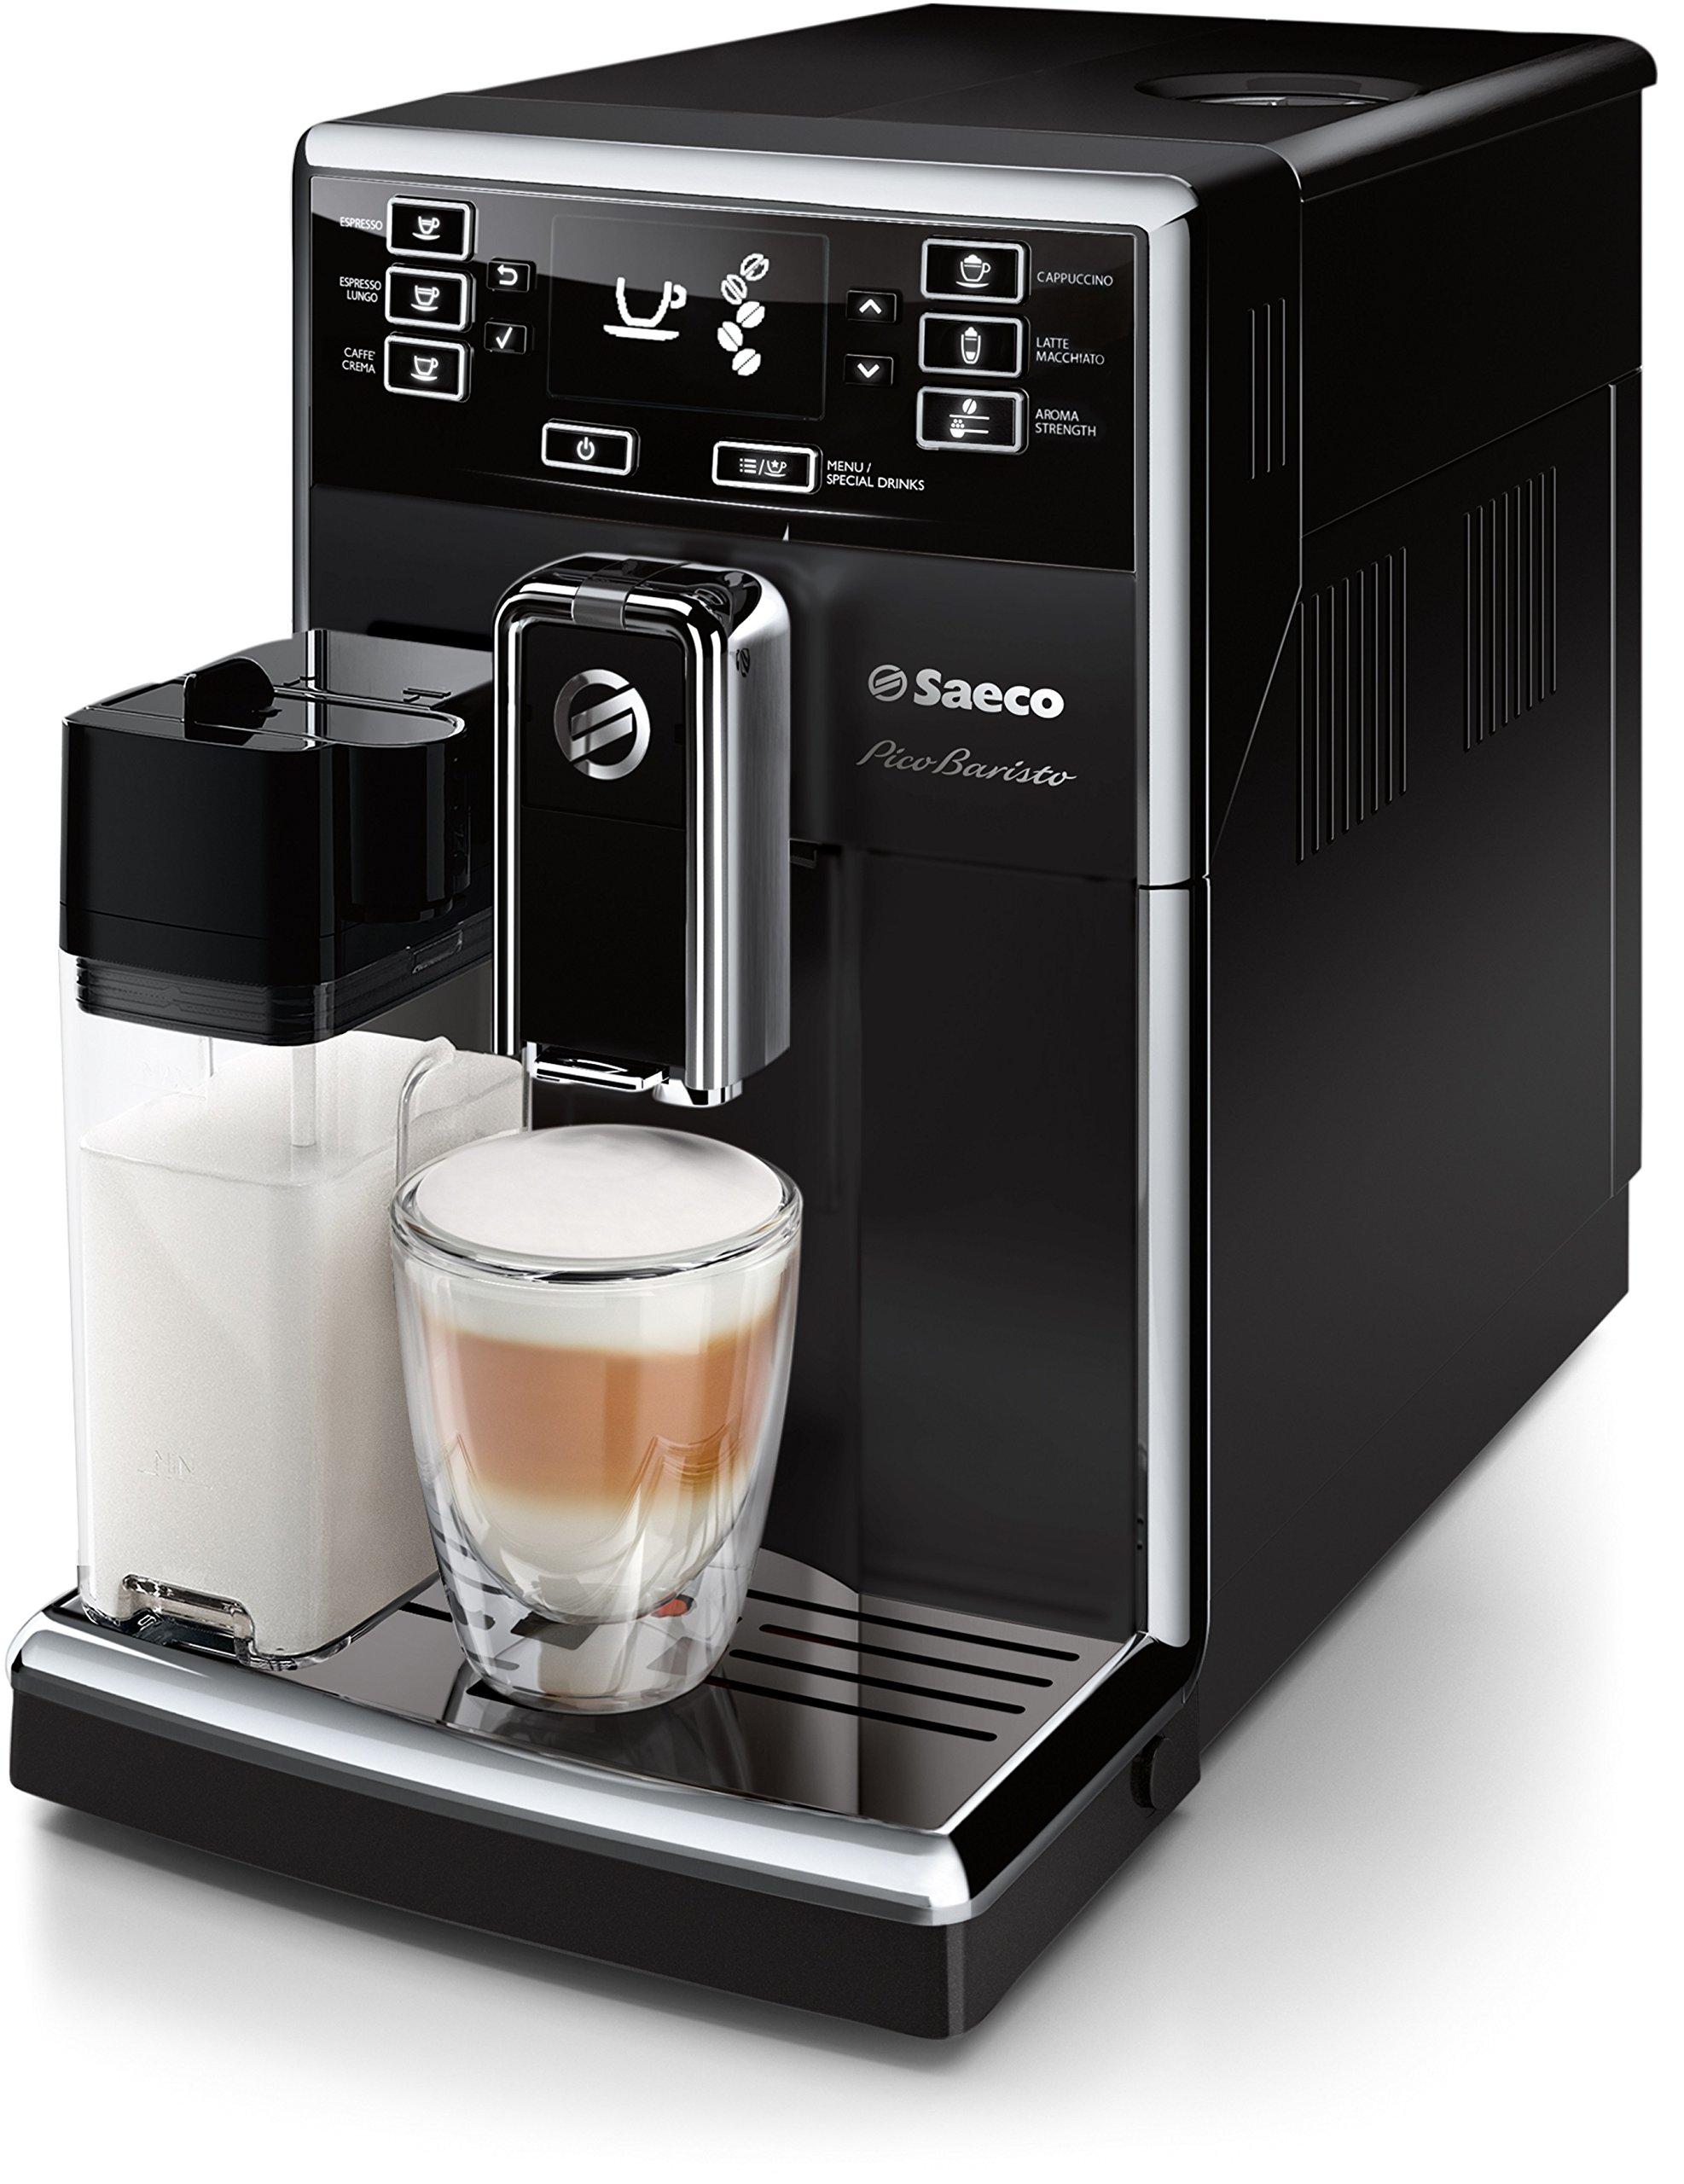 Saeco HD8925/01 PicoBaristo Kaffeevollautomat (Milchsystem) schwarz